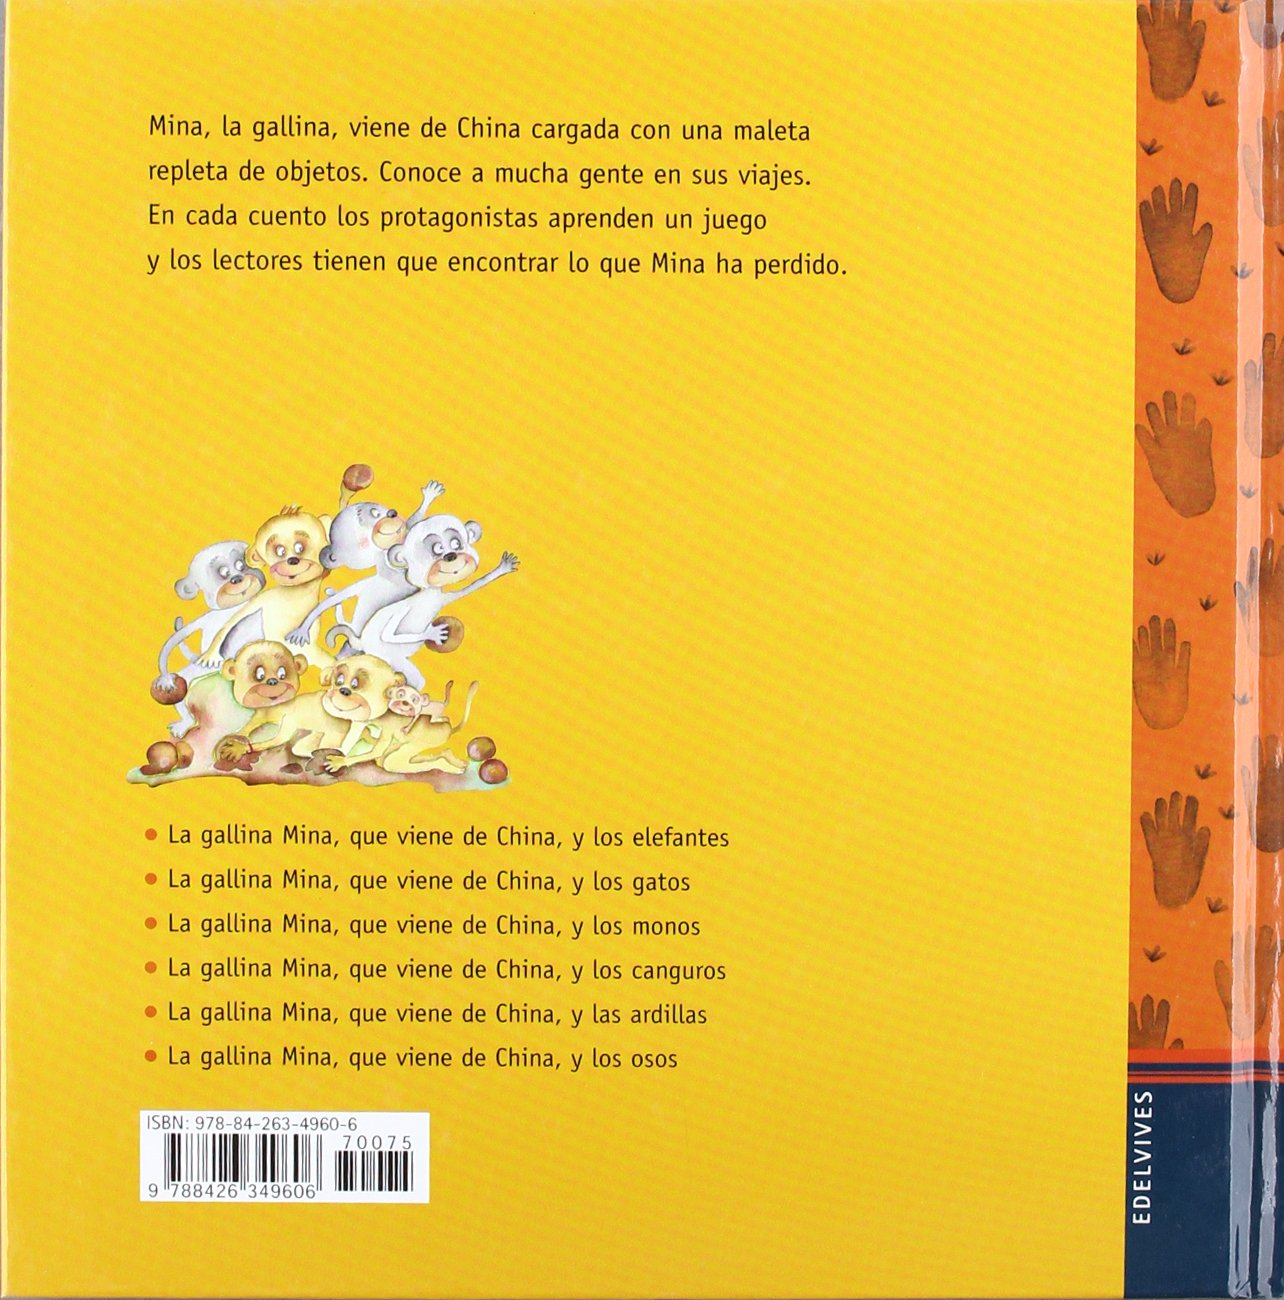 La gallina Mina que viene de China y los monos: Mercè Arànega: 9788426349606: Amazon.com: Books